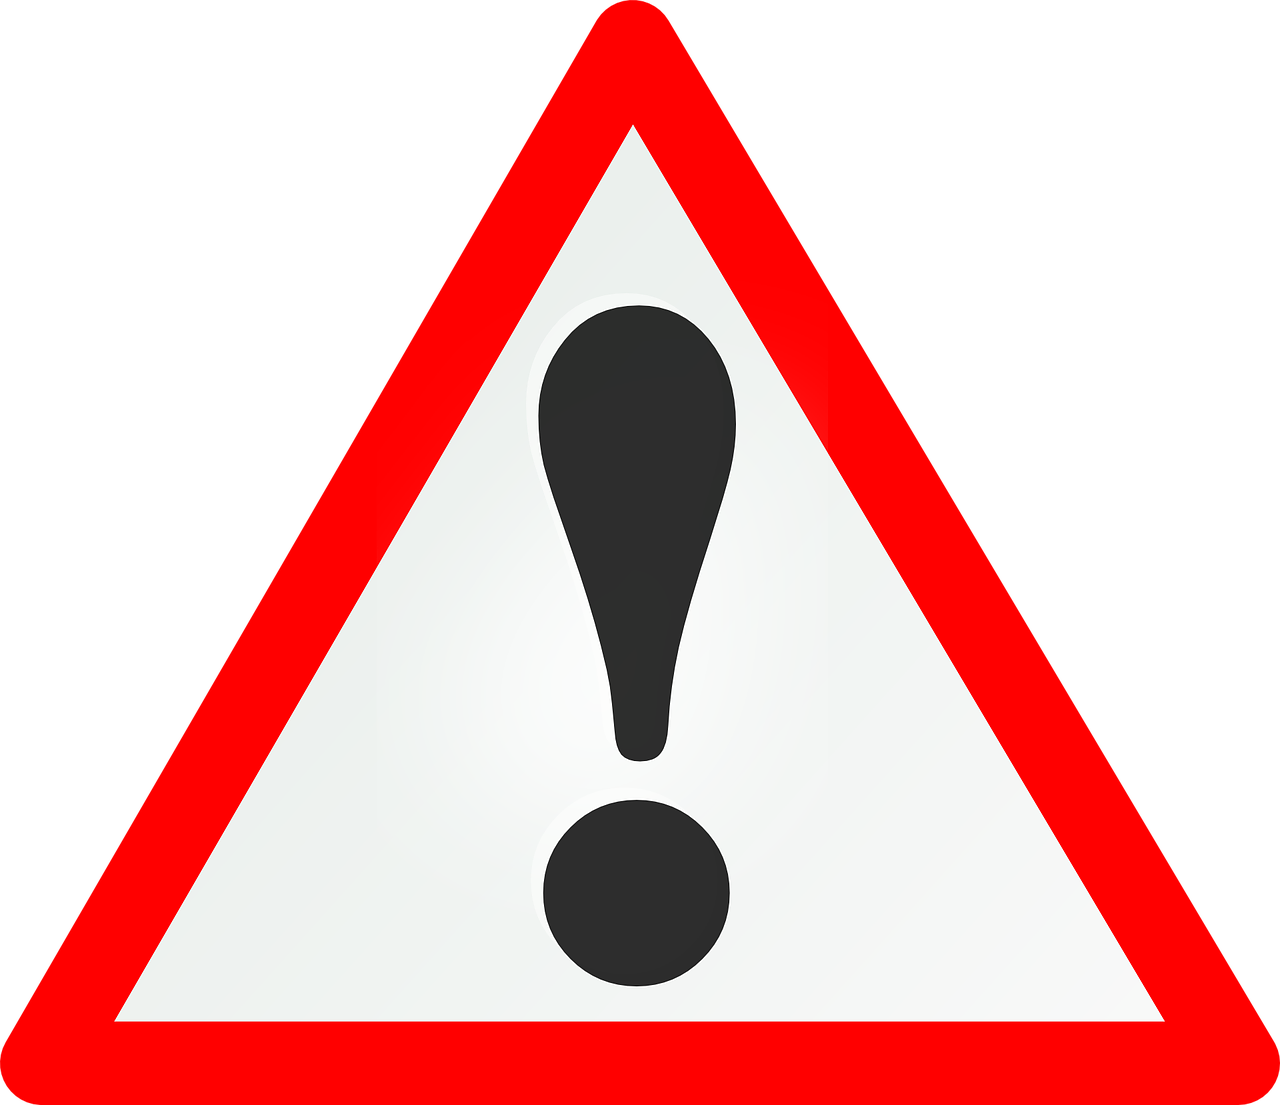 {#warning-gead7a5f76_1280}